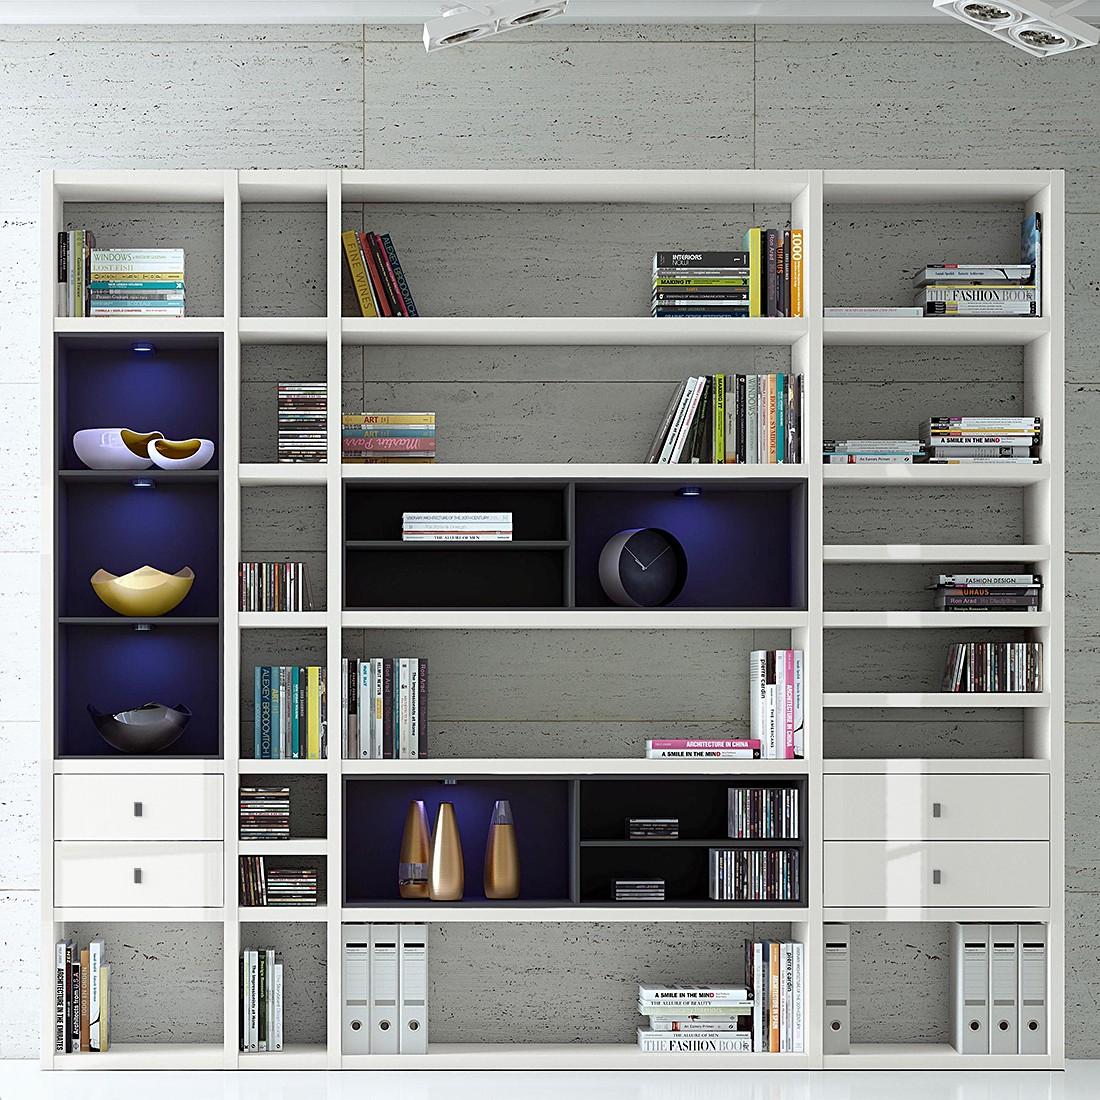 EEK A+, XXL Regalwand Emporior IV.A - RGB LED-Beleuchtung - Hochglanz Weiß / Schwarz, loftscape